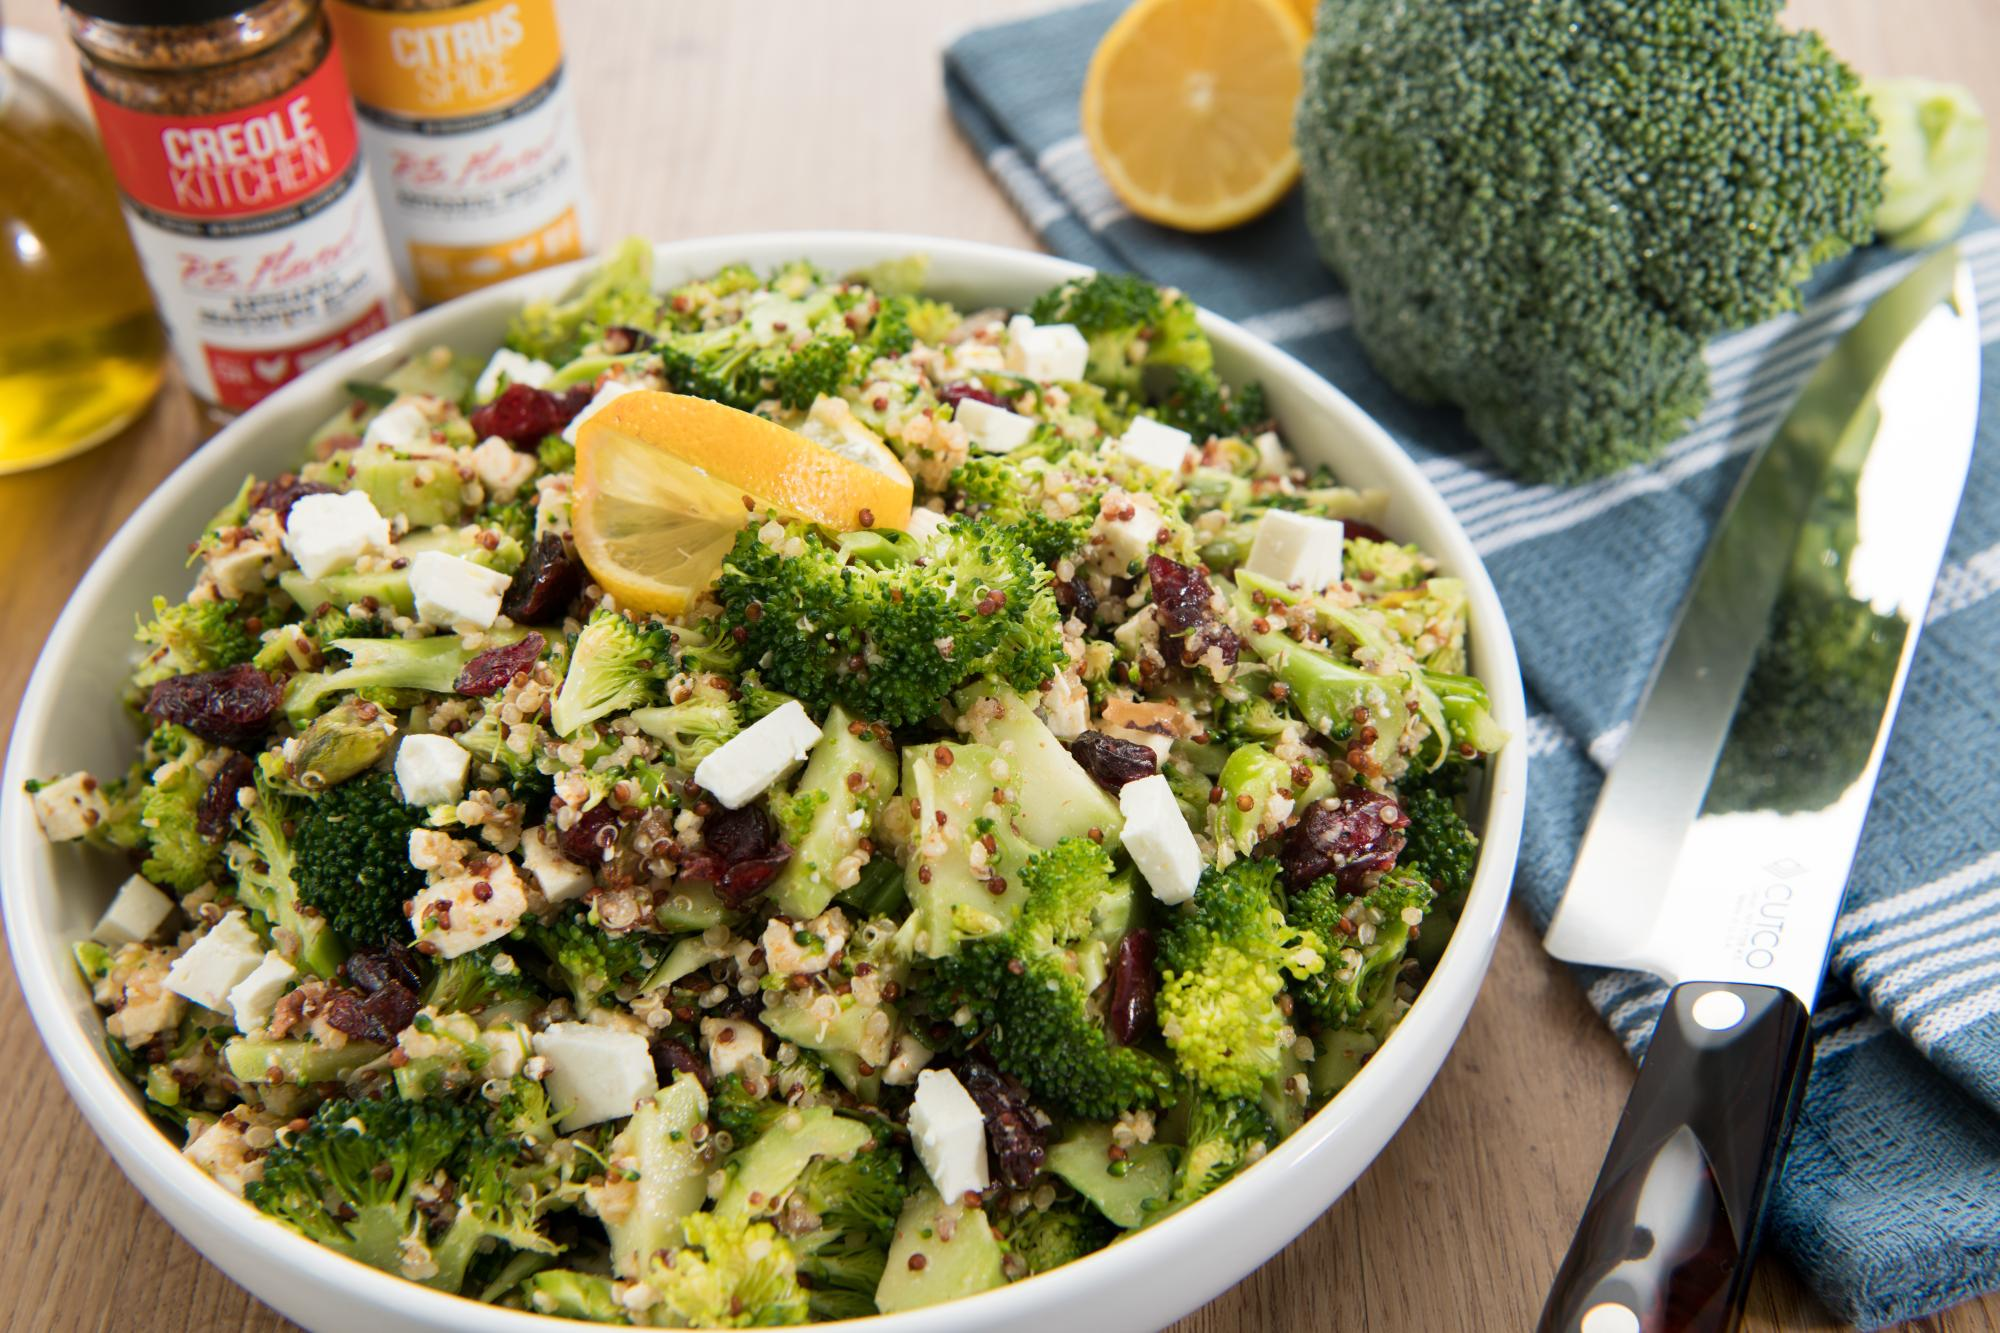 Citrus Spiced Broccoli and Quinoa Salad